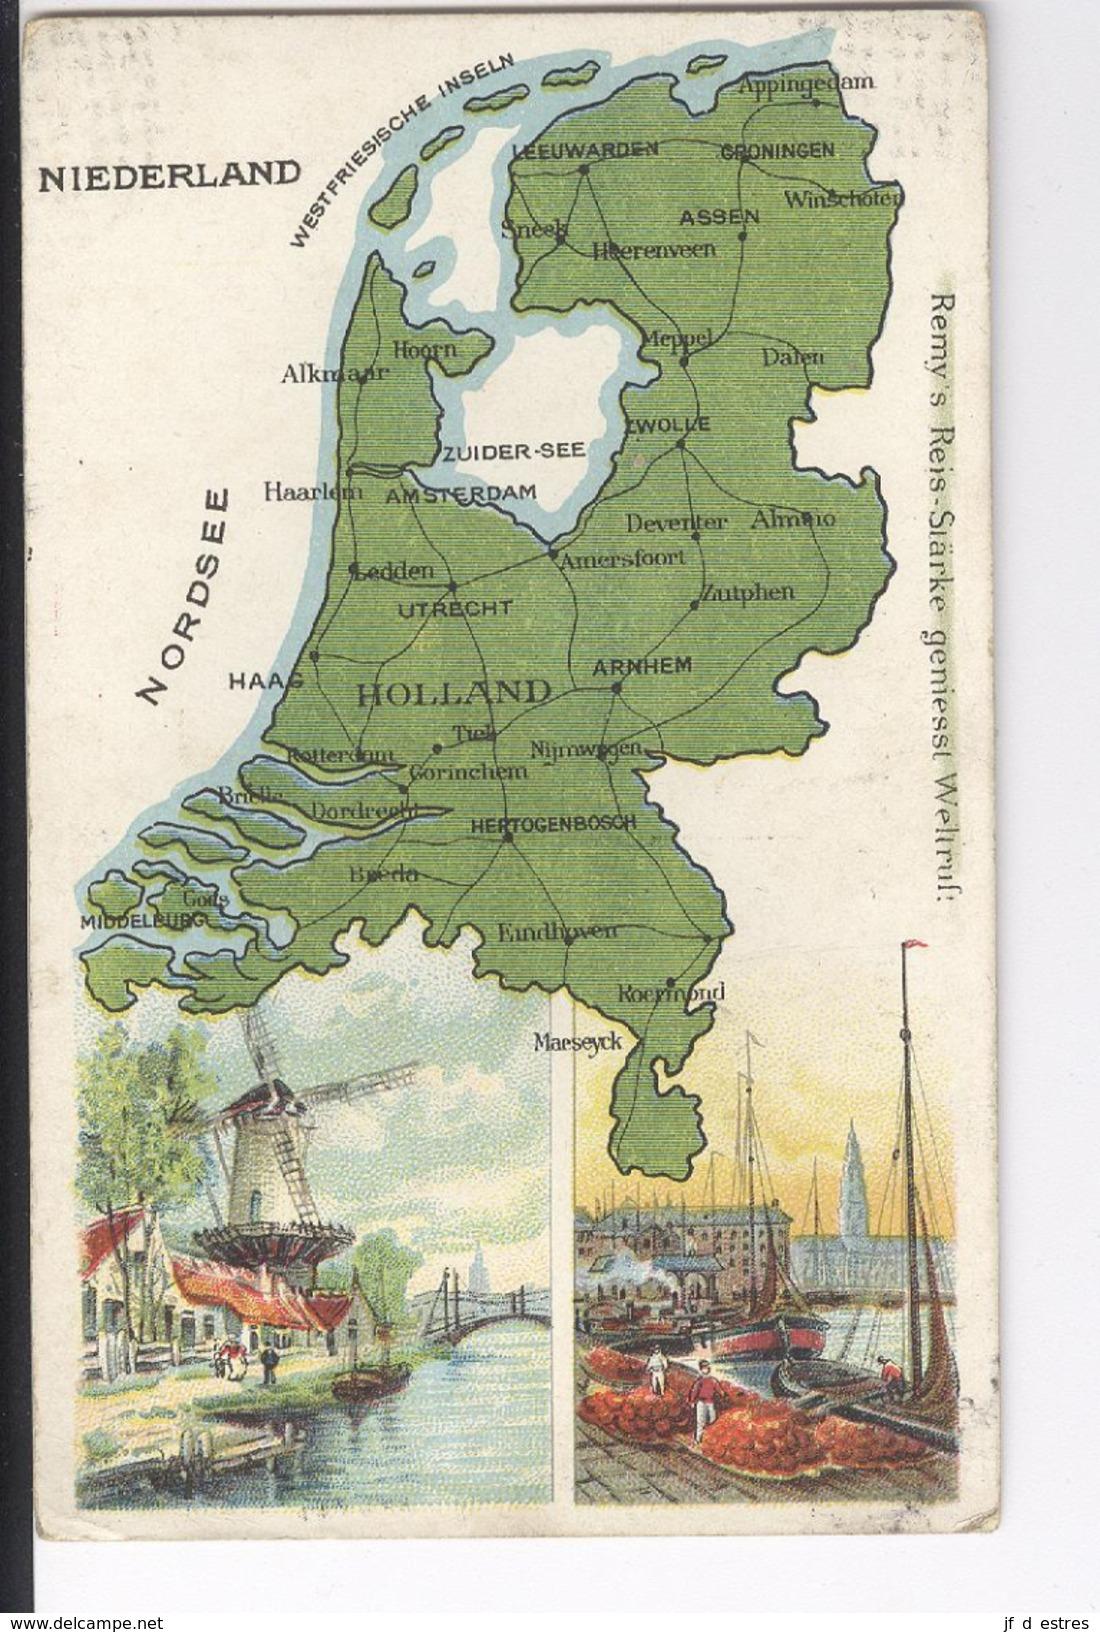 CPAS Niederland   Carte Géographique Illustrée Amidon Remy 1919 Nederland Pays-Bas - Cartes Postales